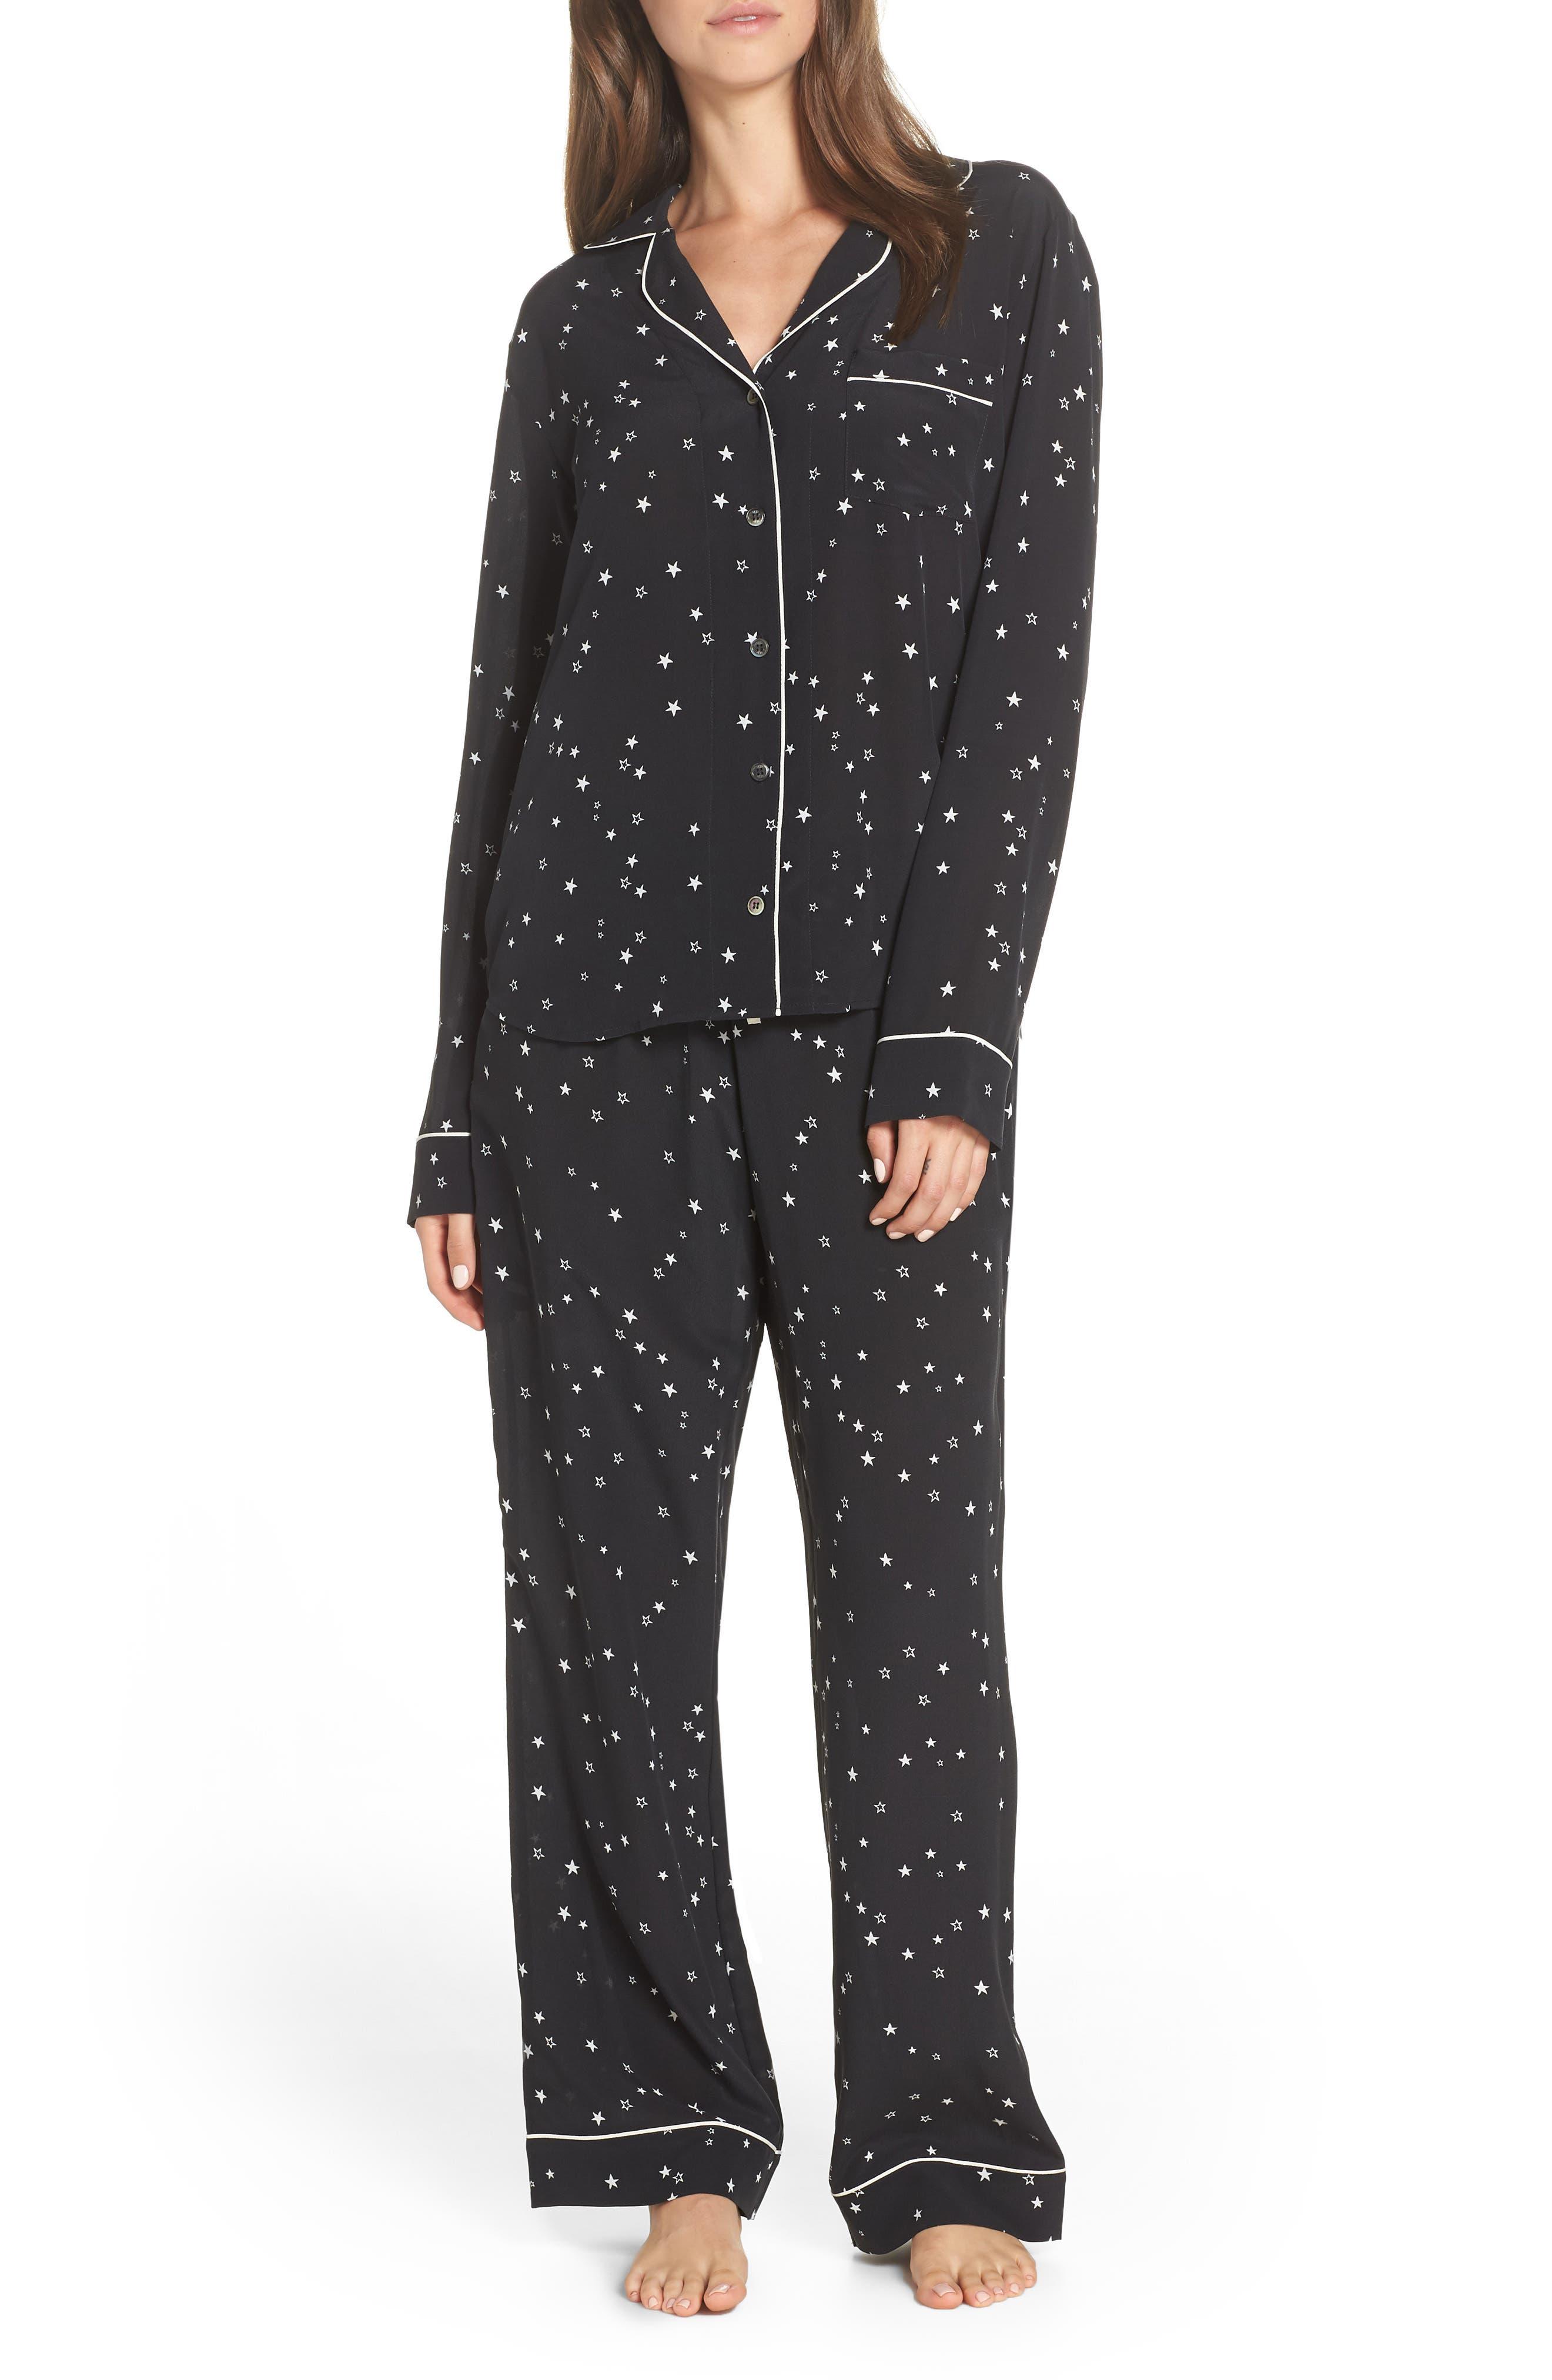 Raven Silk Pajamas,                             Main thumbnail 1, color,                             BLACK STARS